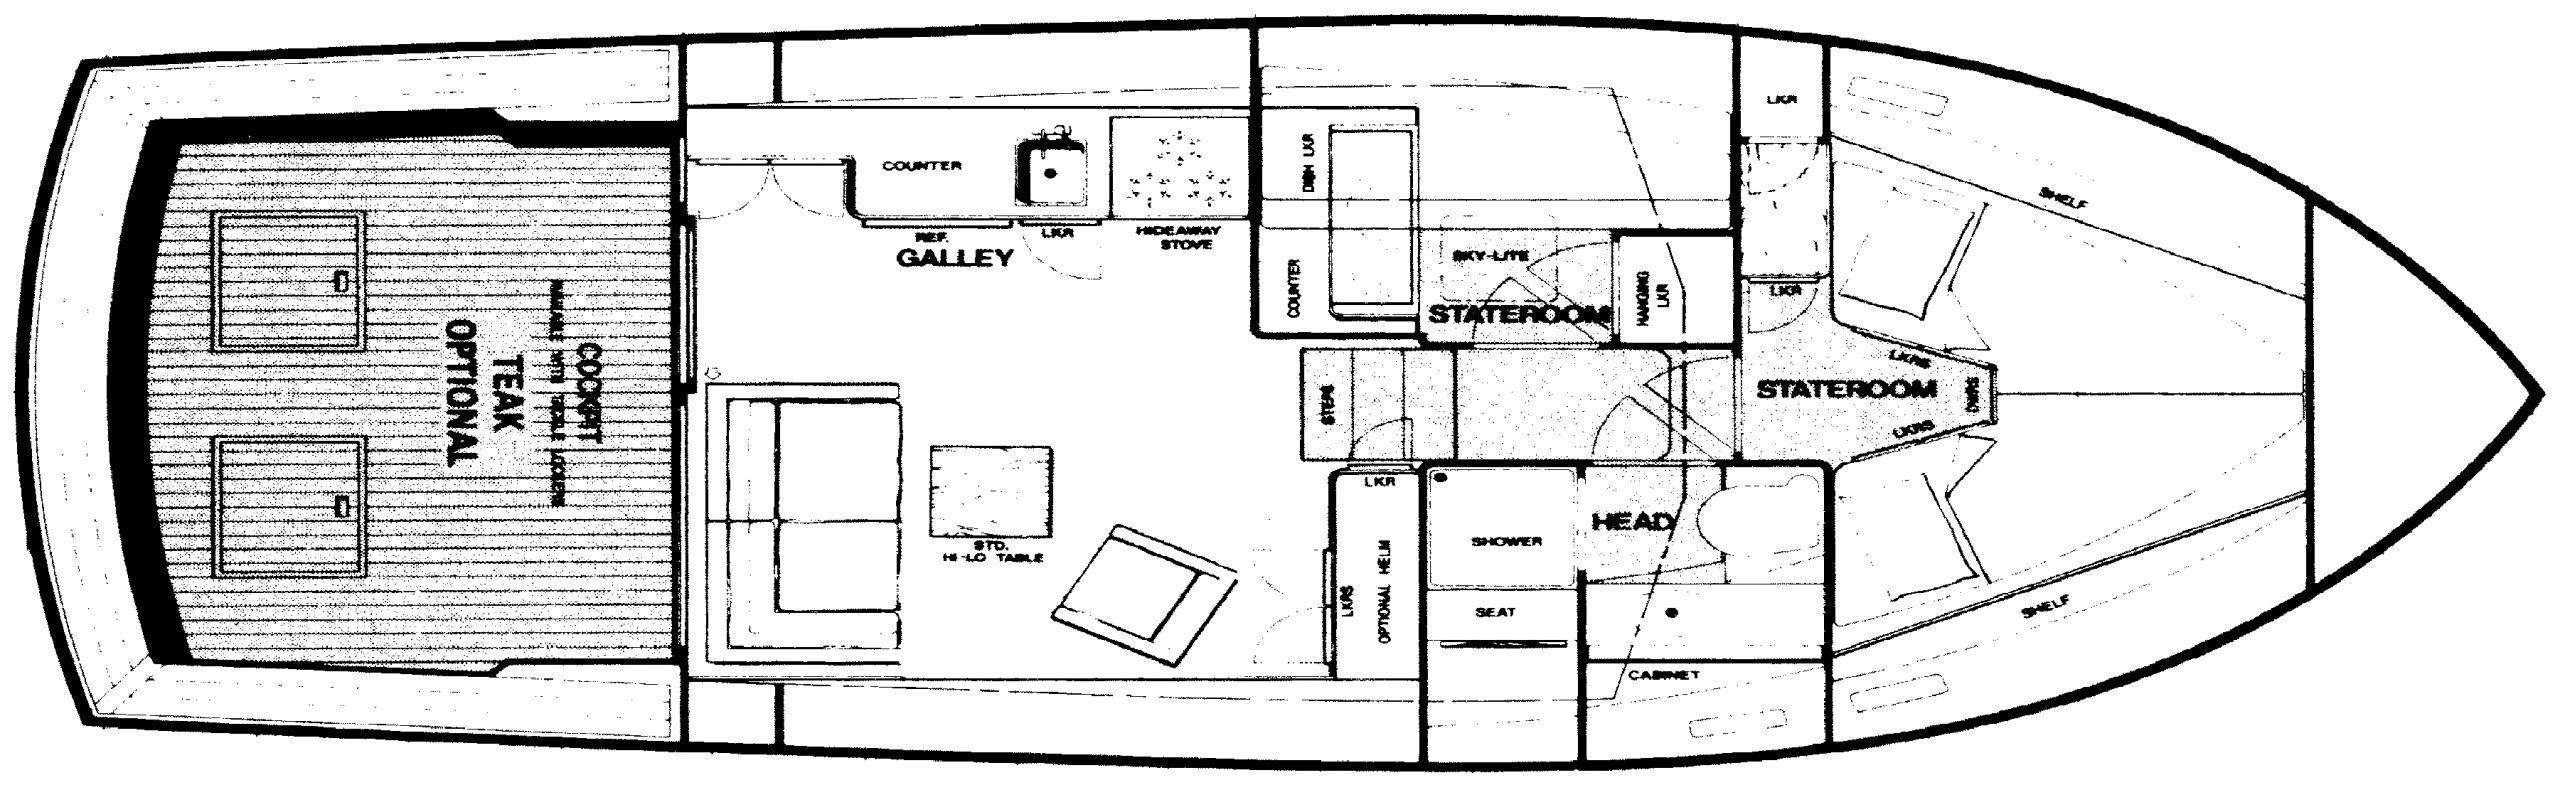 33 Sedan Floor Plan 2